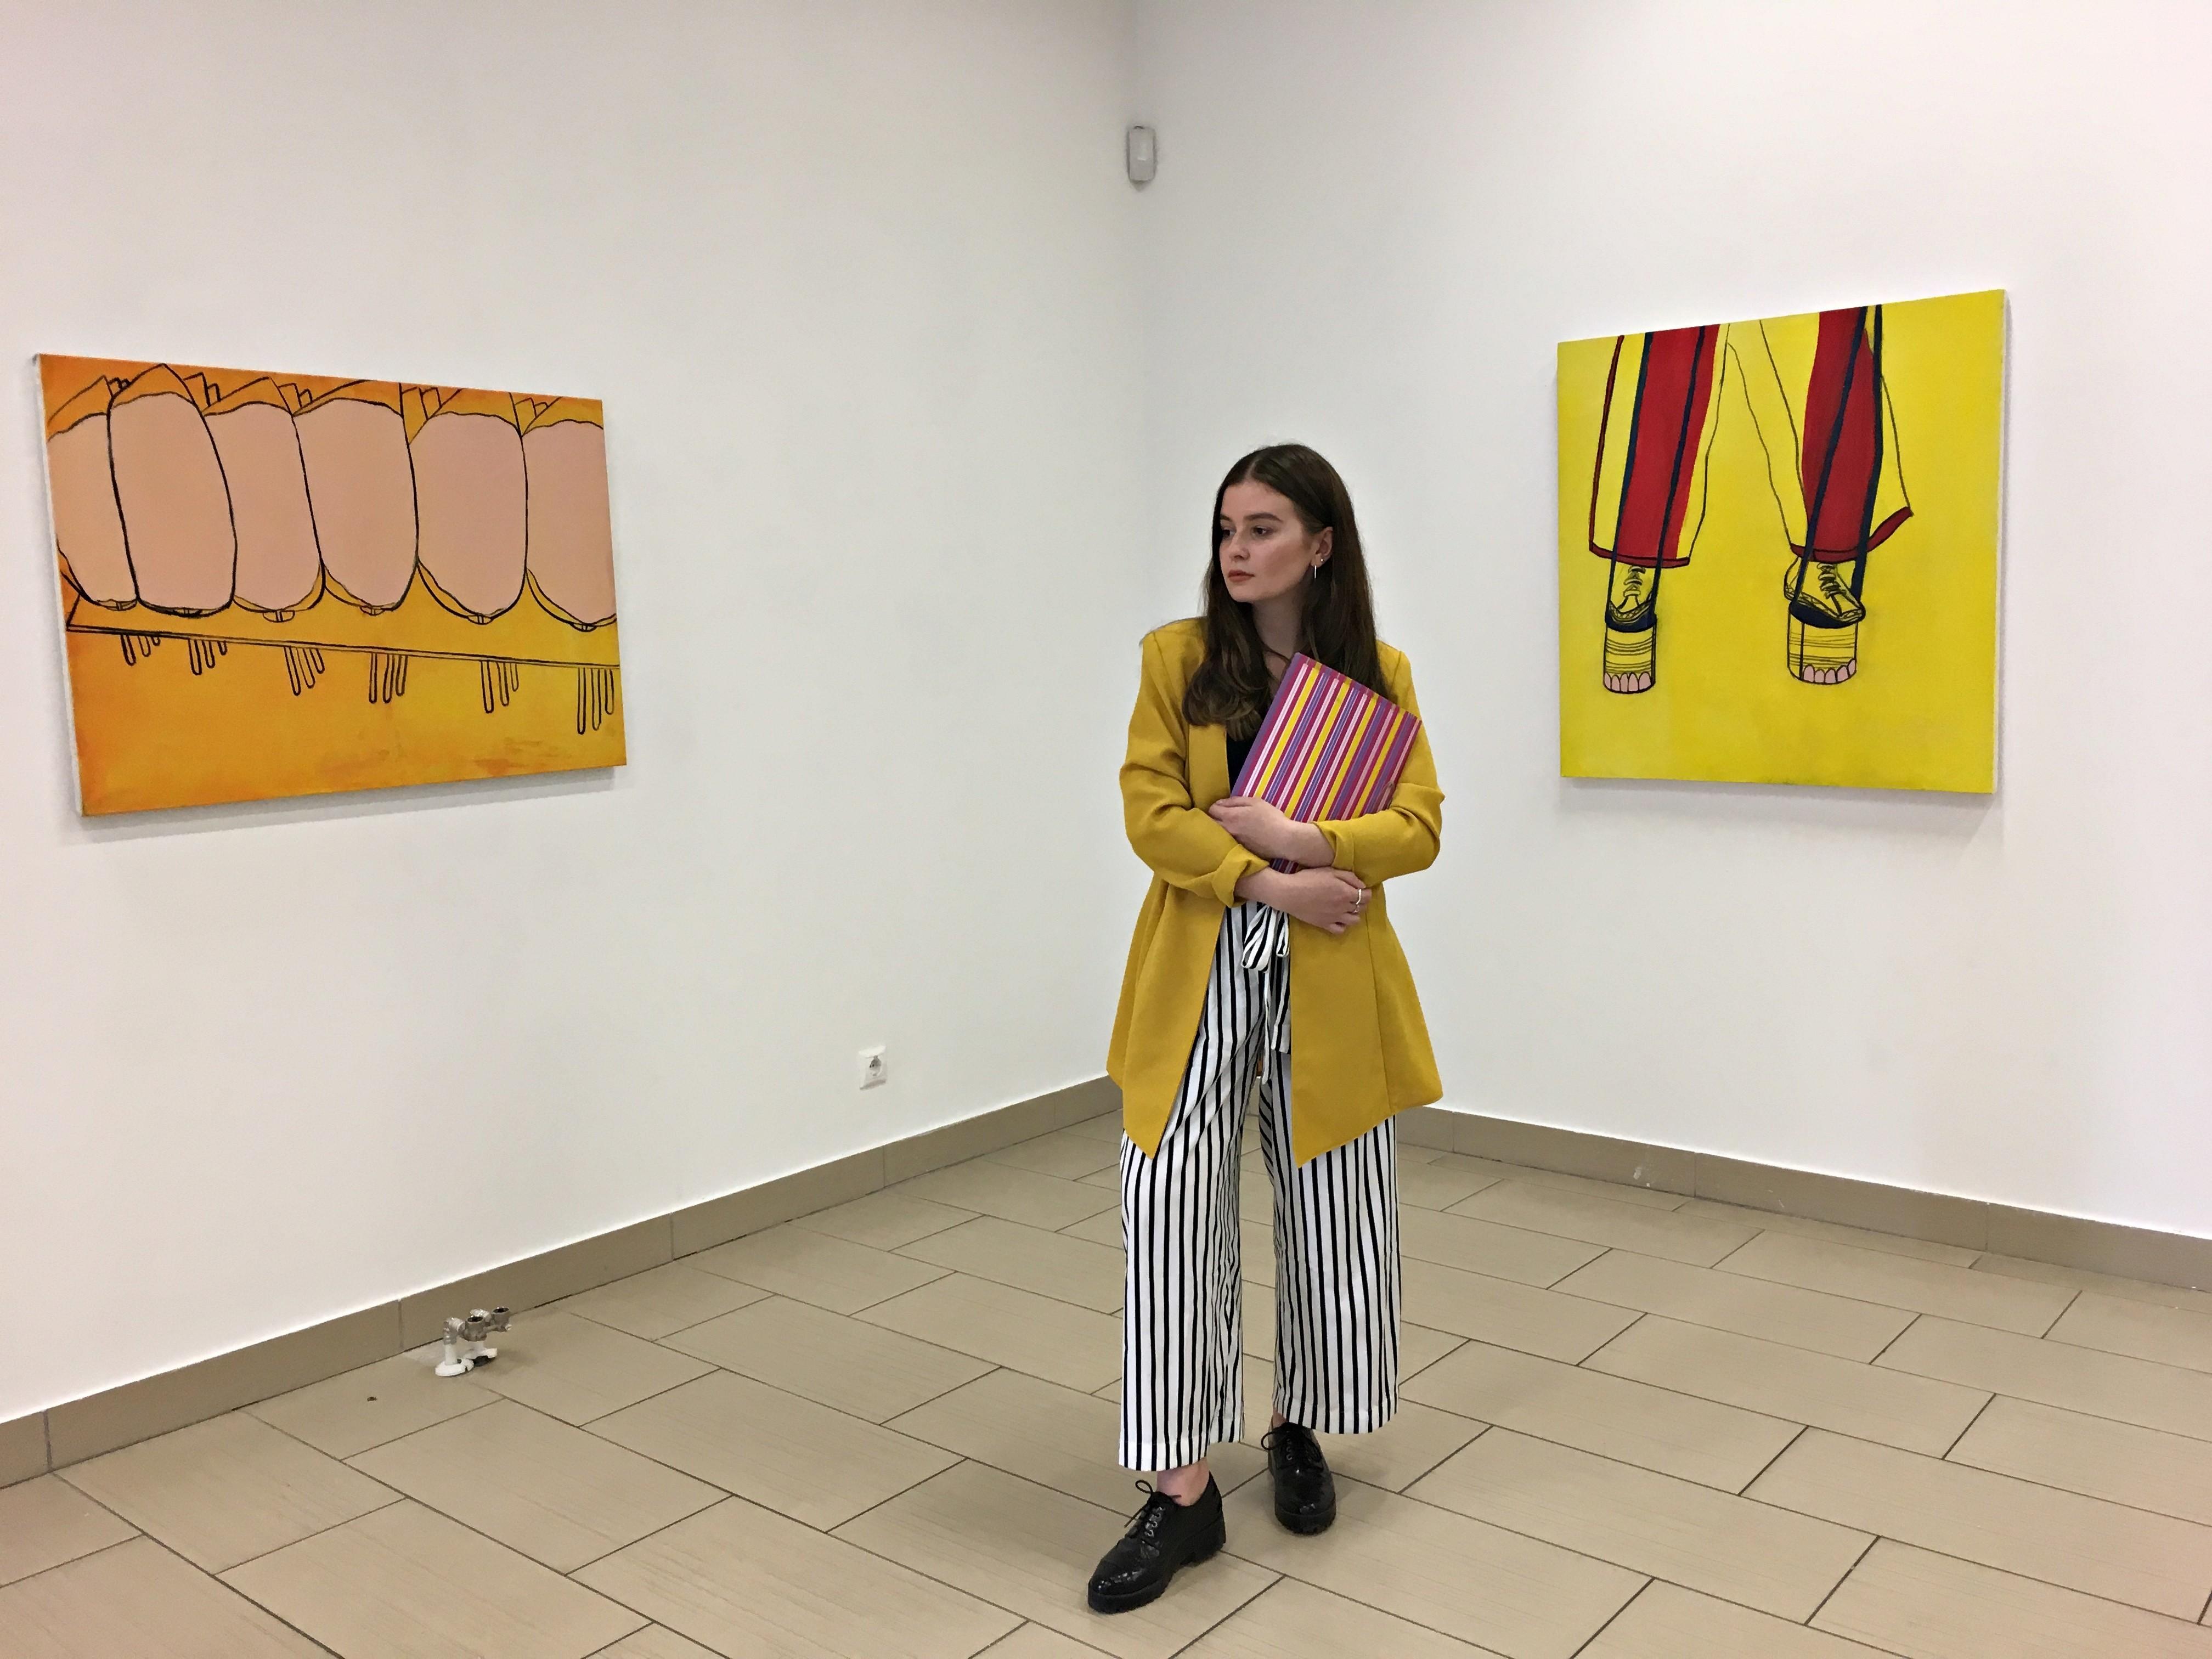 Viktorija Podprugina